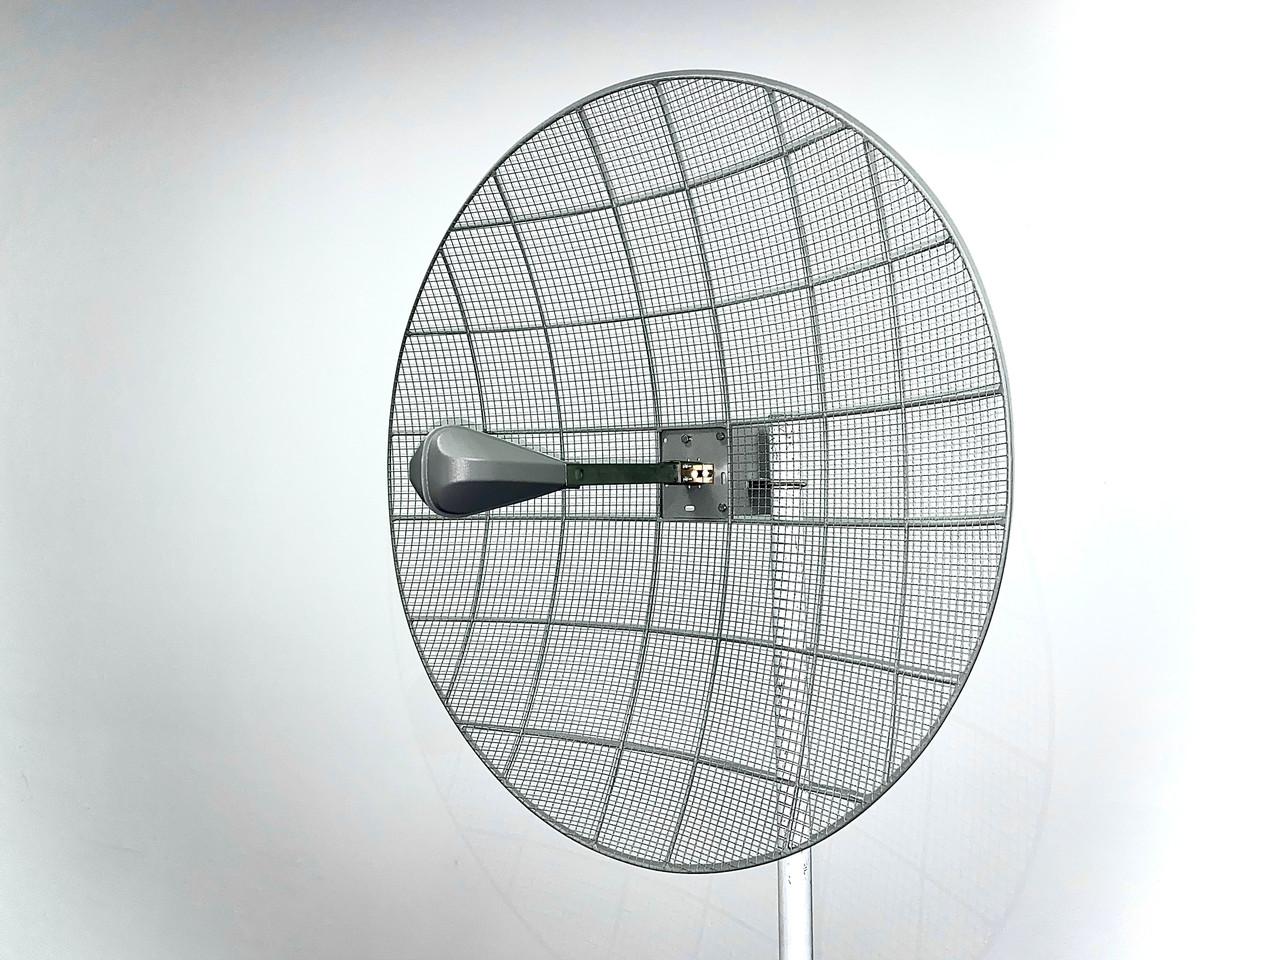 Kroks KNA30 - 1700/2700 - Параболическая 4G MIMO антенна 30 дБ